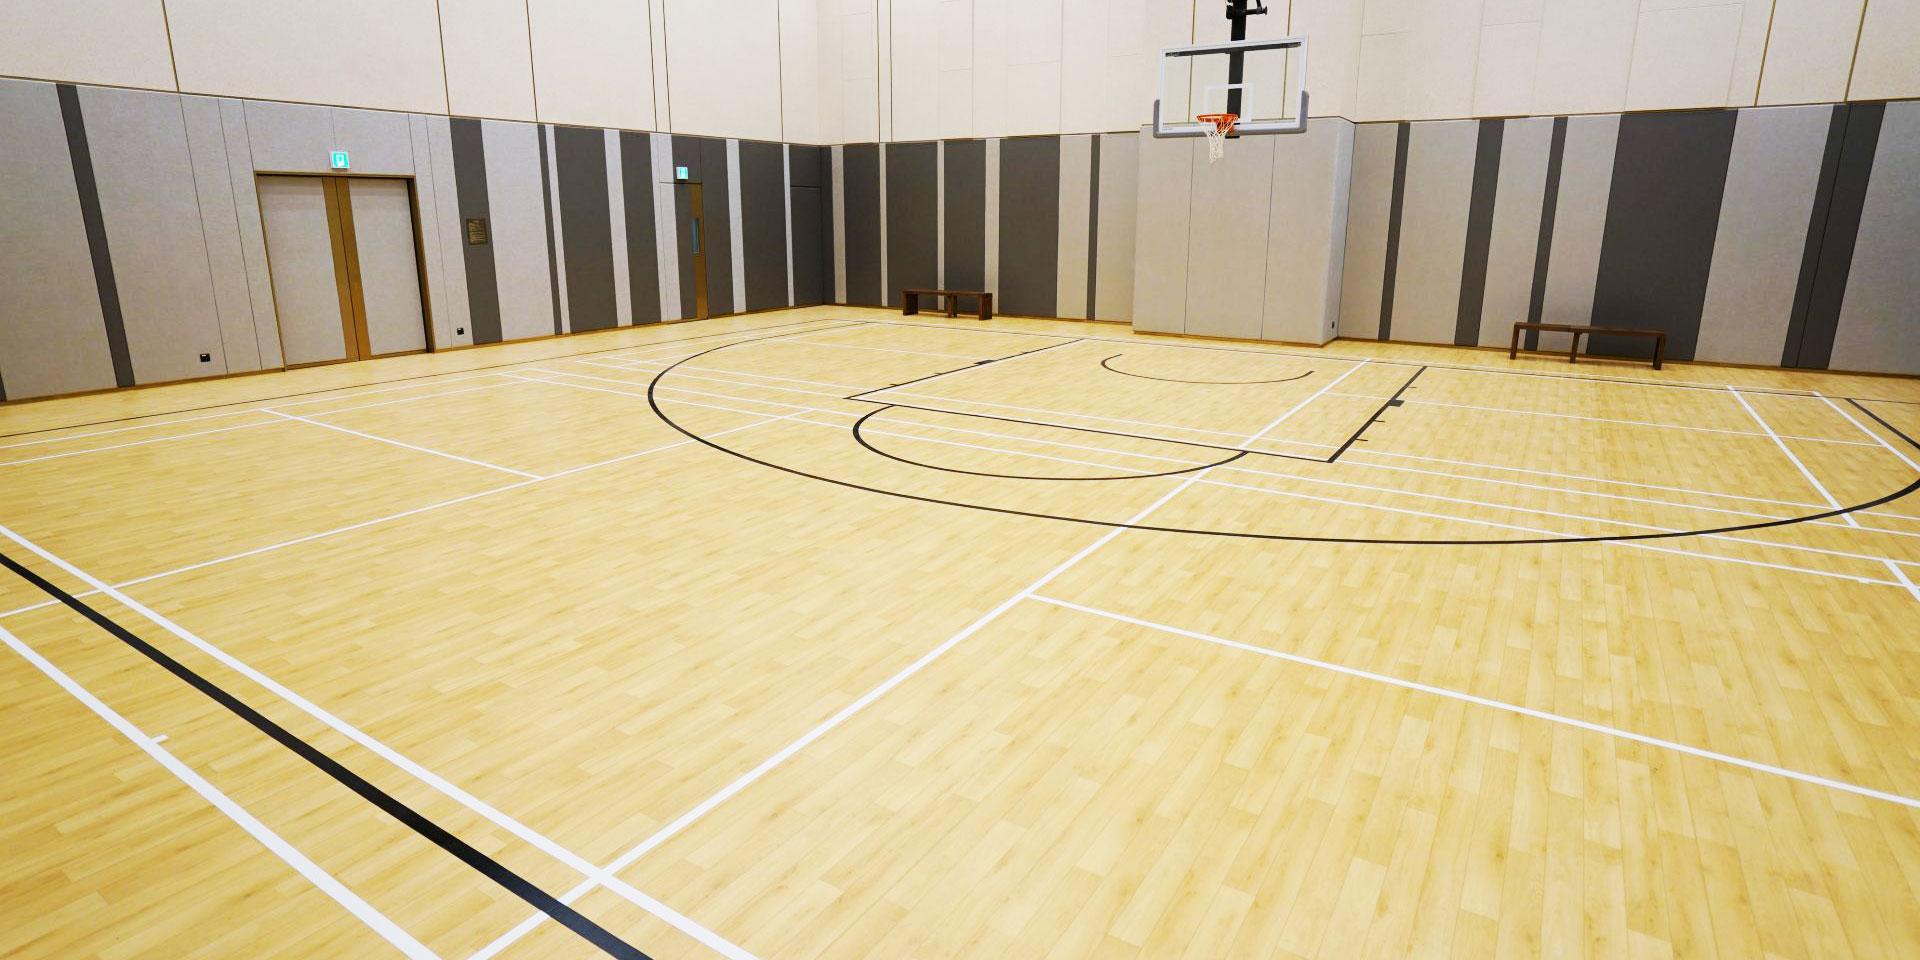 Športni parketi, nogomet, rokomet, košarka, dvorana